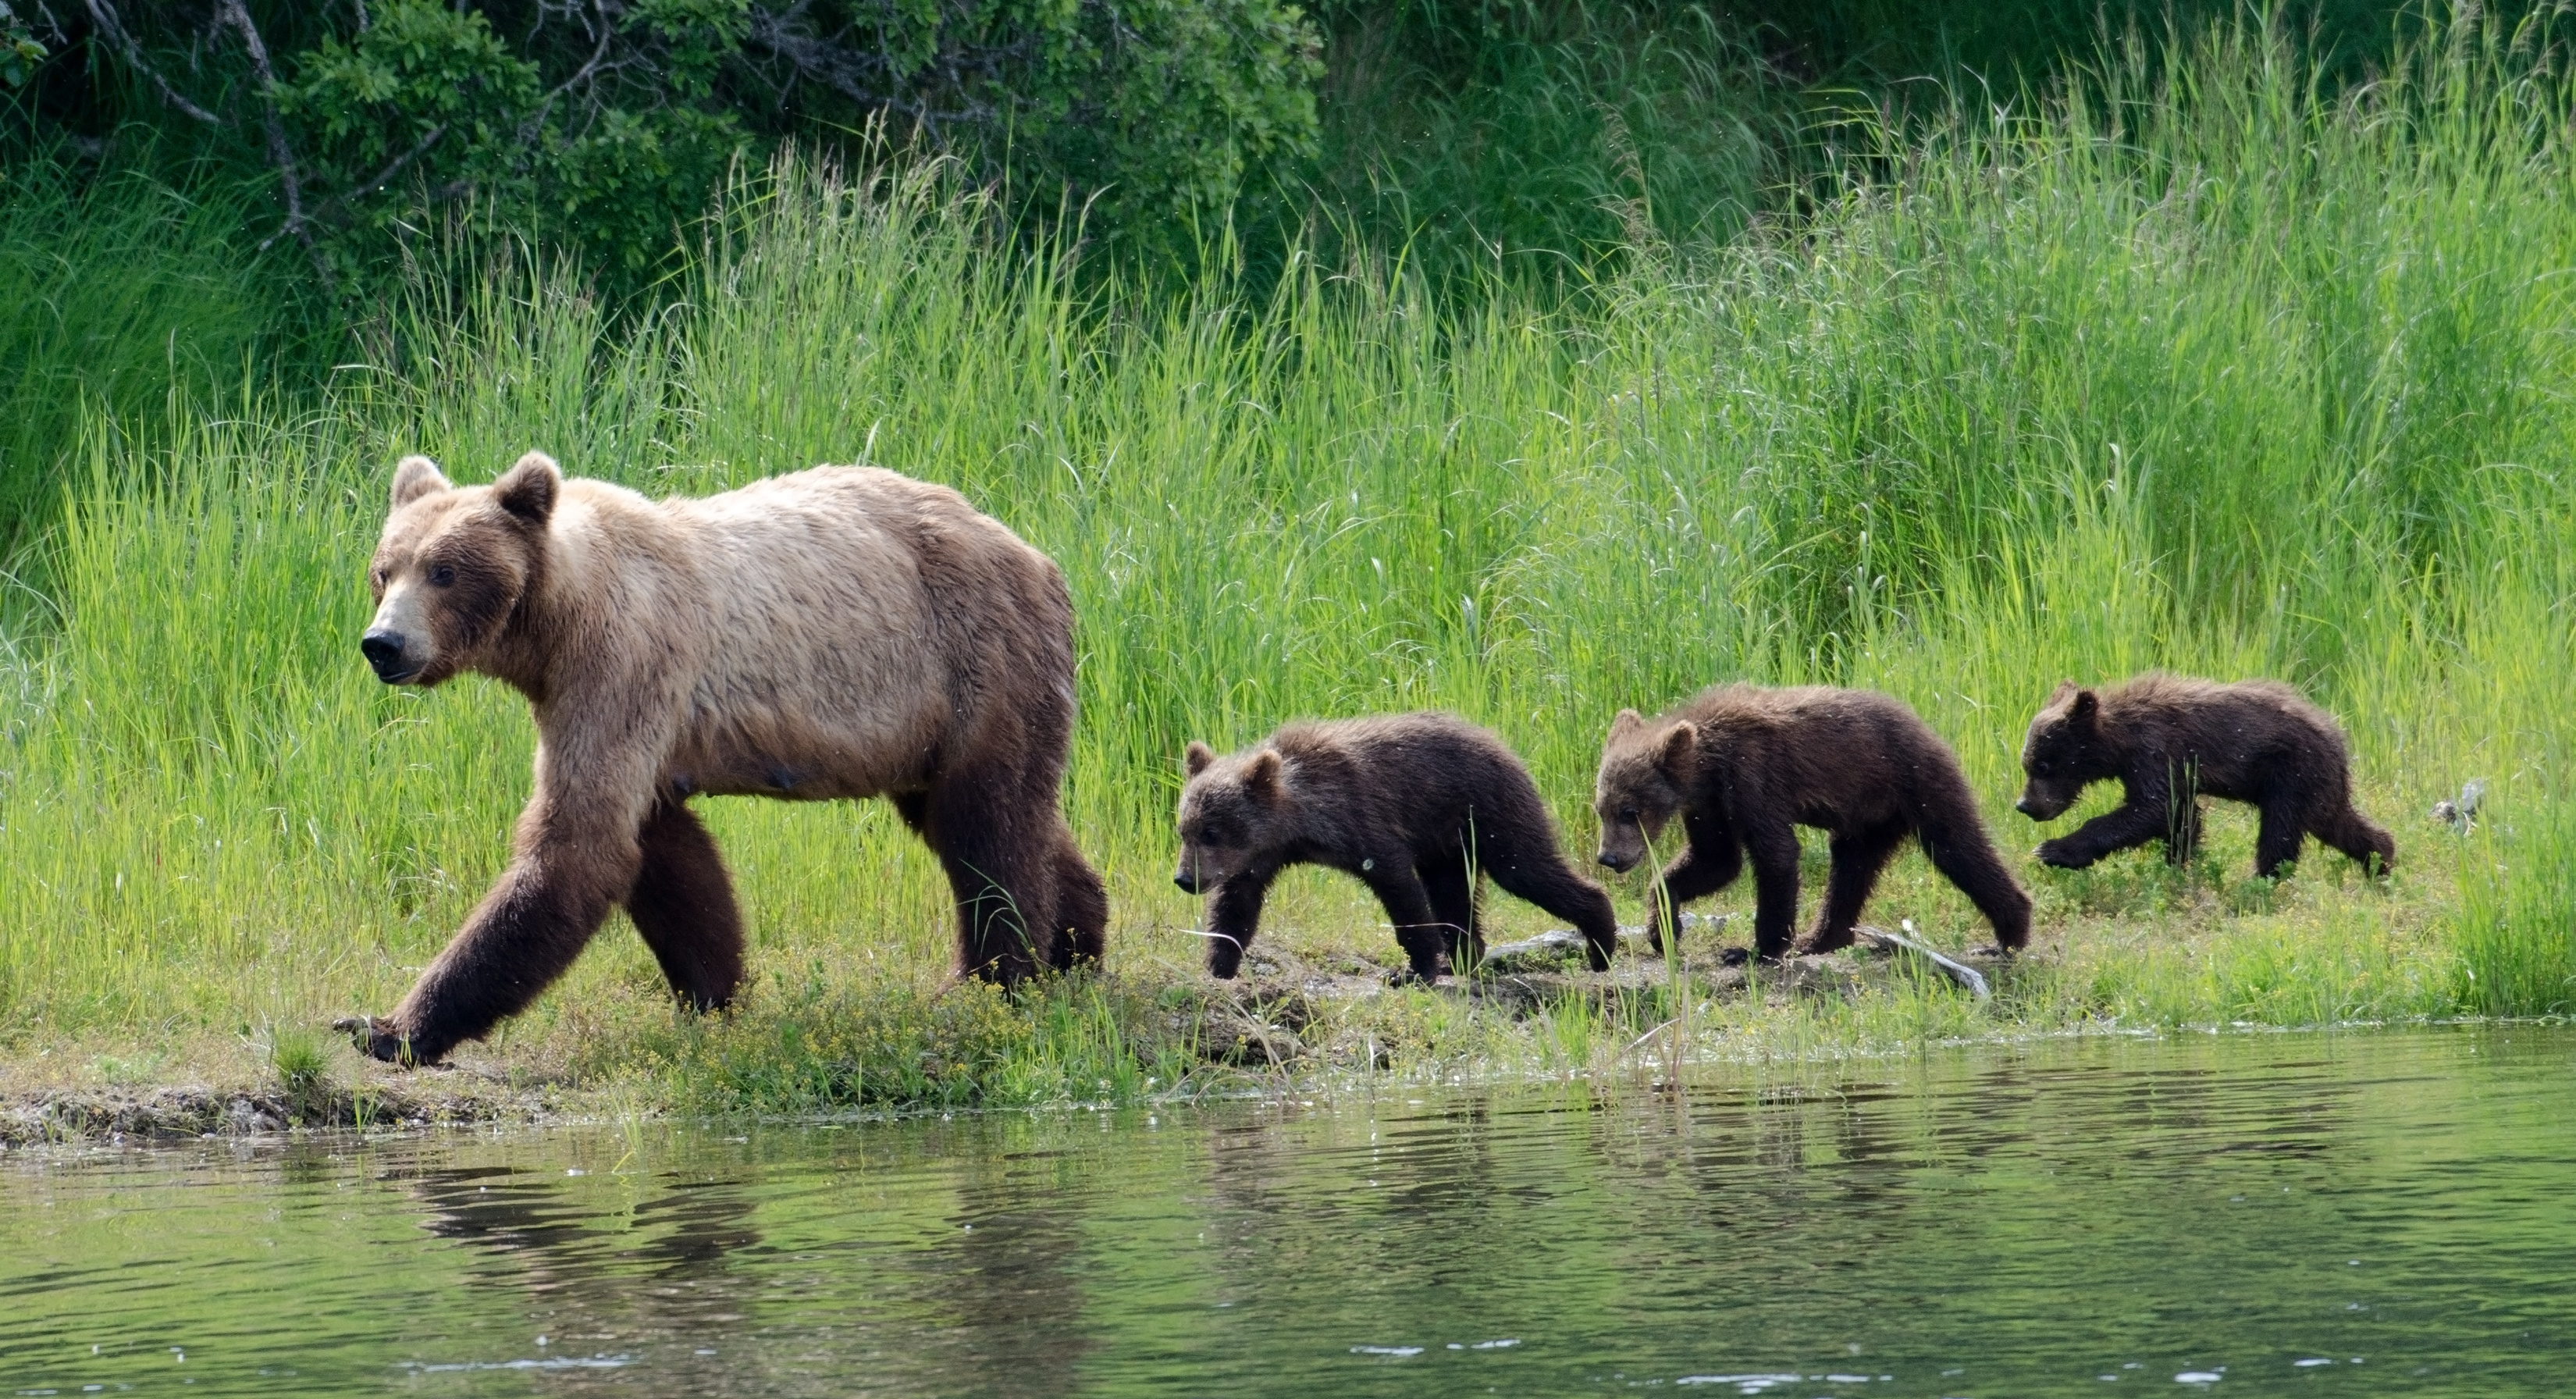 https://posterjackcanada.files.wordpress.com/2013/04/mother-bear-and-three-cubs.jpg